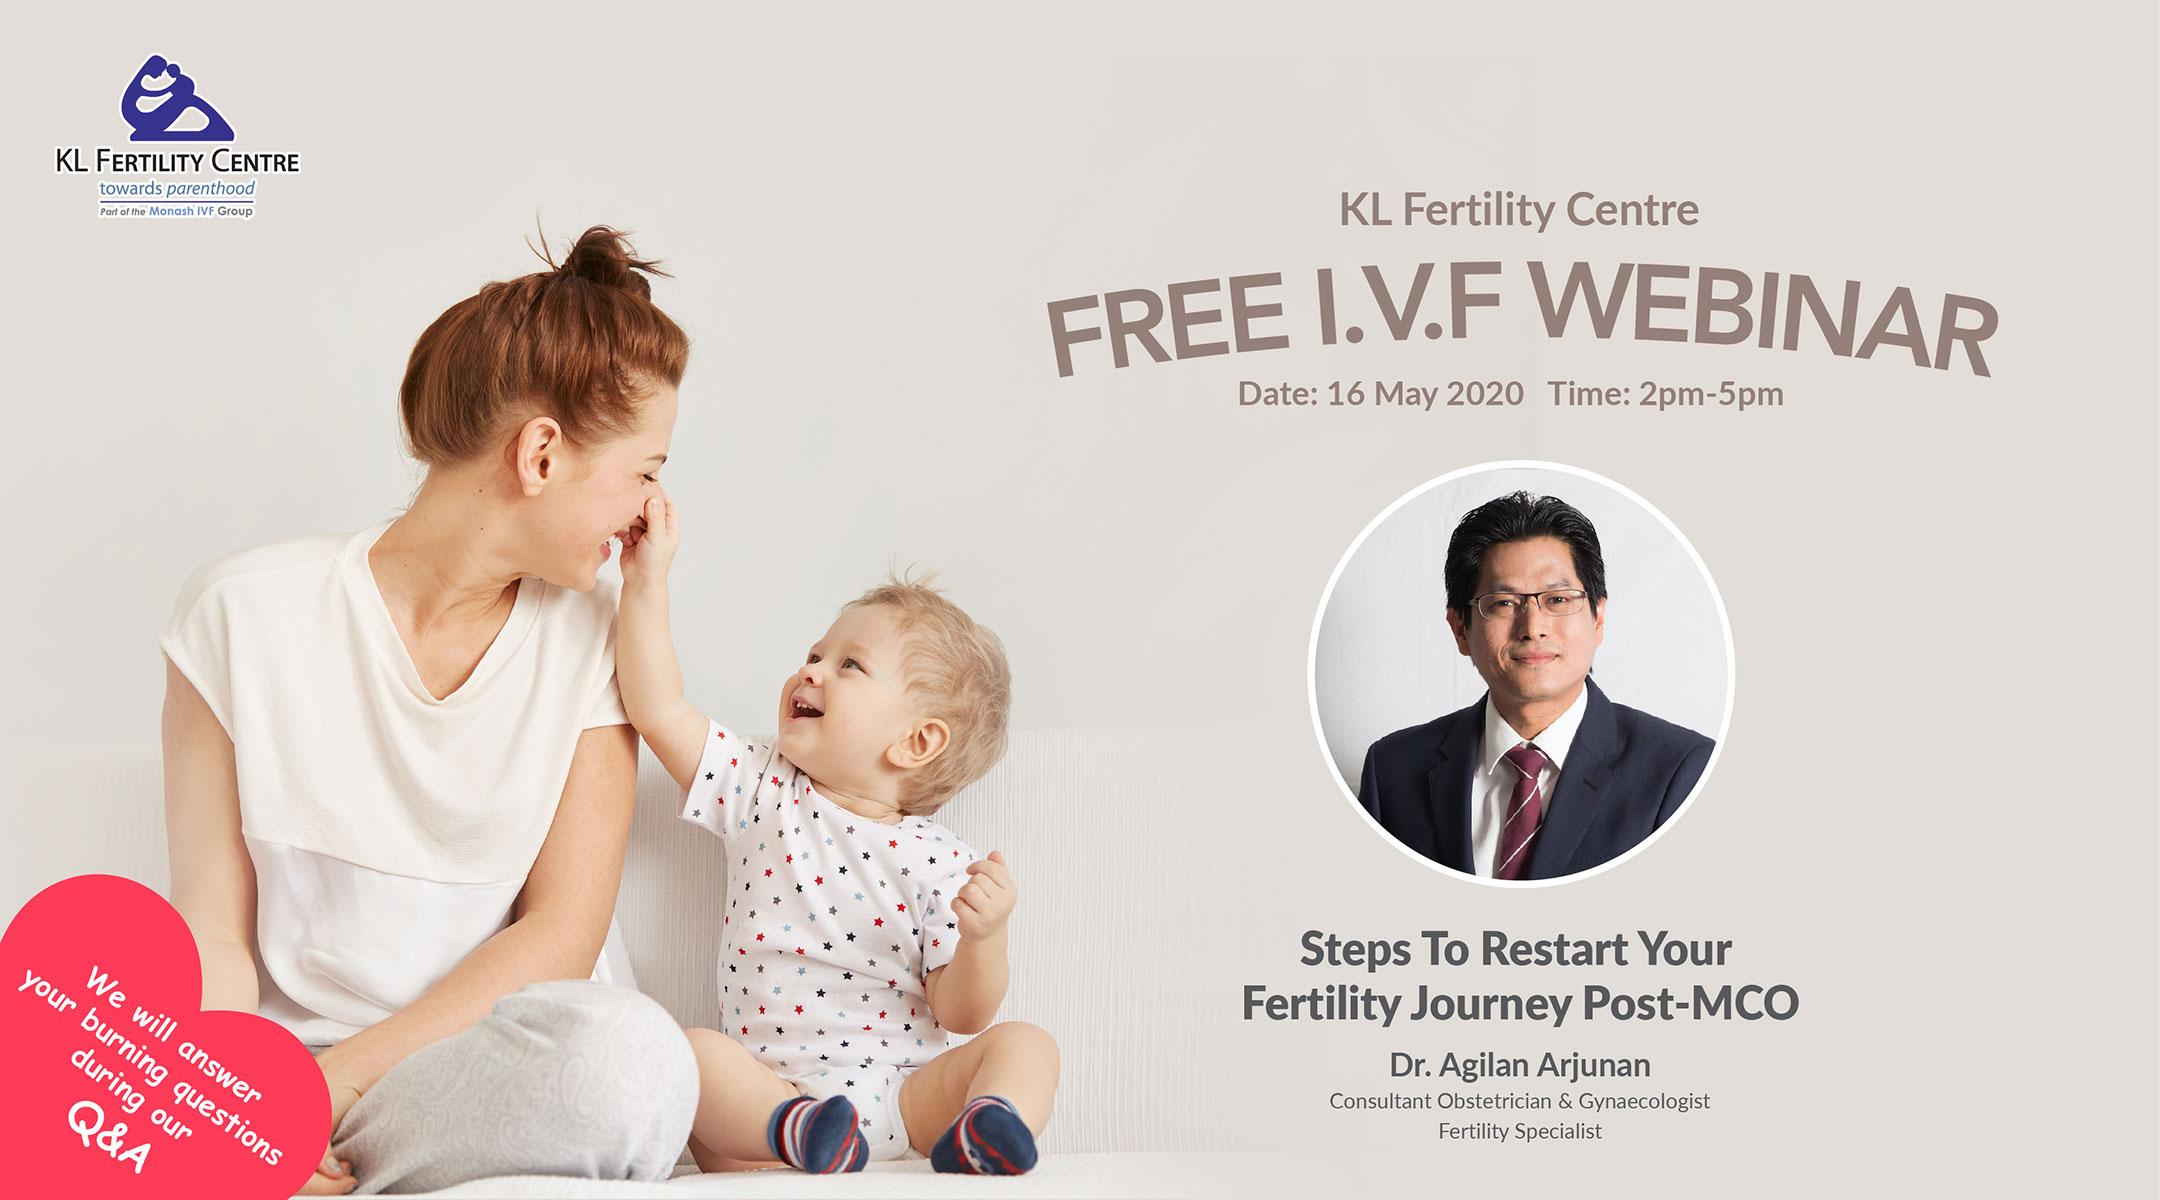 Free IVF Webinar 16 May 2020 - Dr. Agilan Arjunan